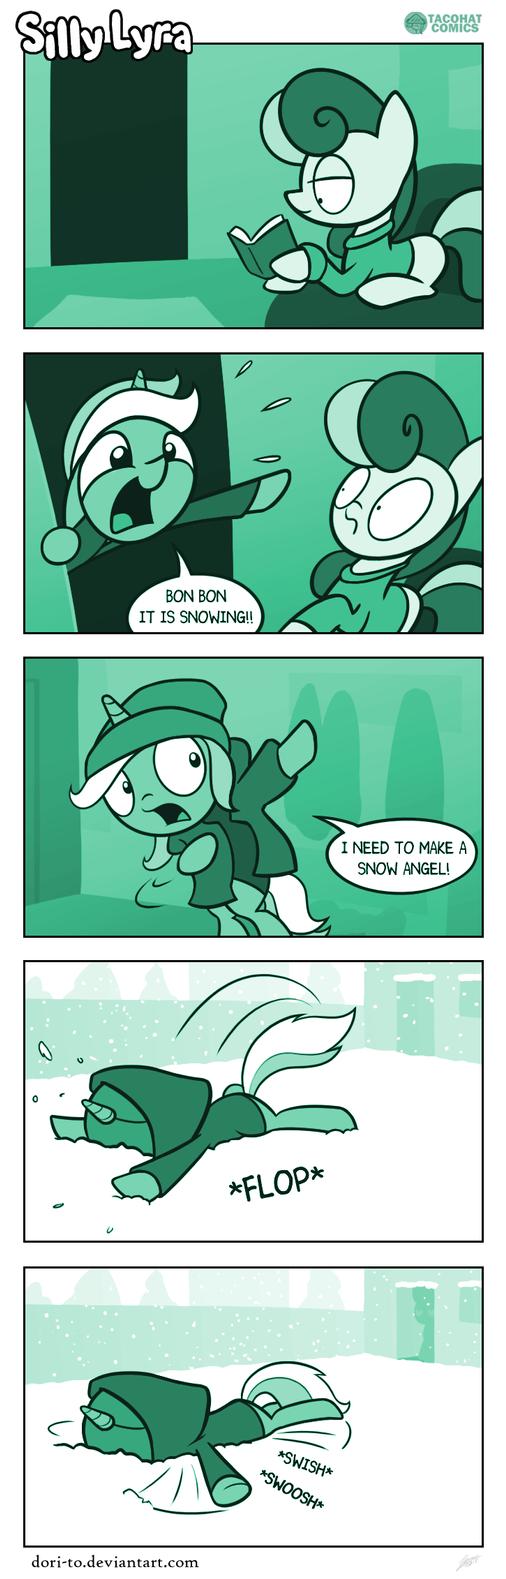 Silly Lyra - Snow Mare by Dori-to